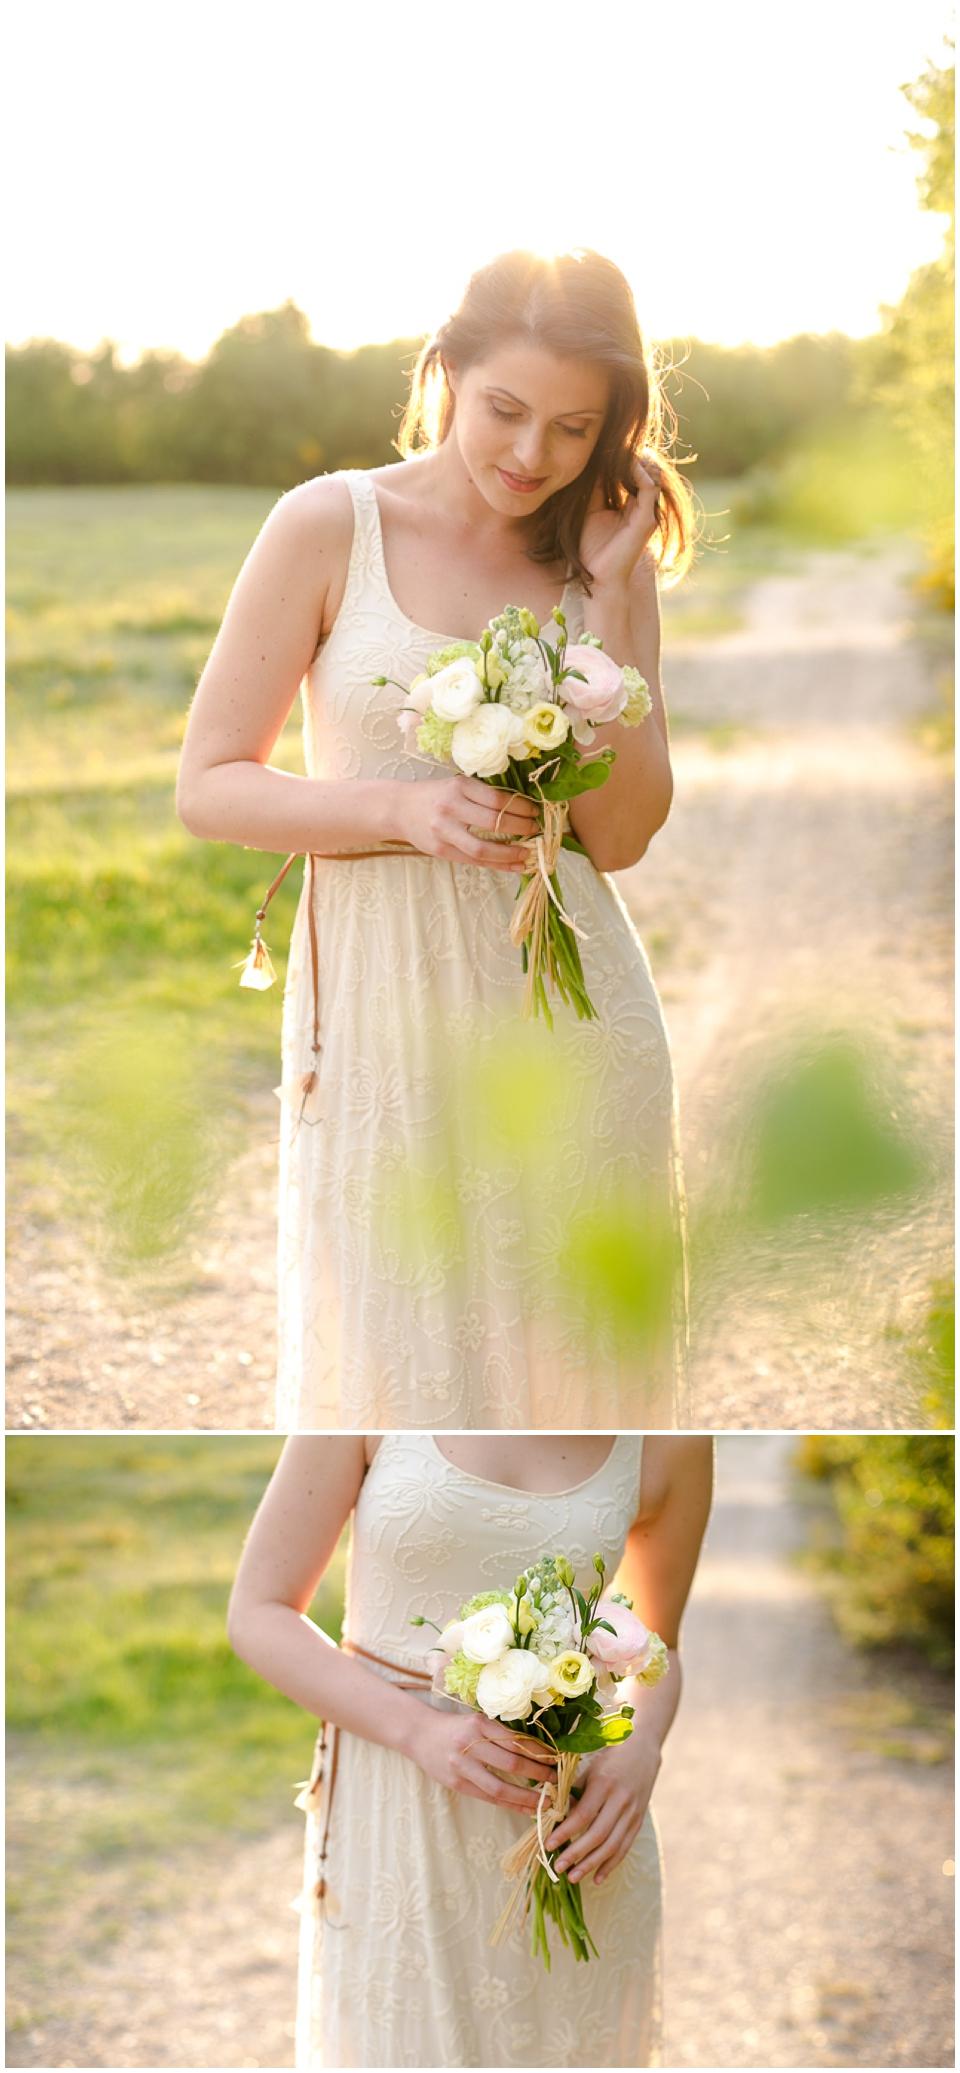 Nicole Wahl Fotografie - Imagefilm_0000